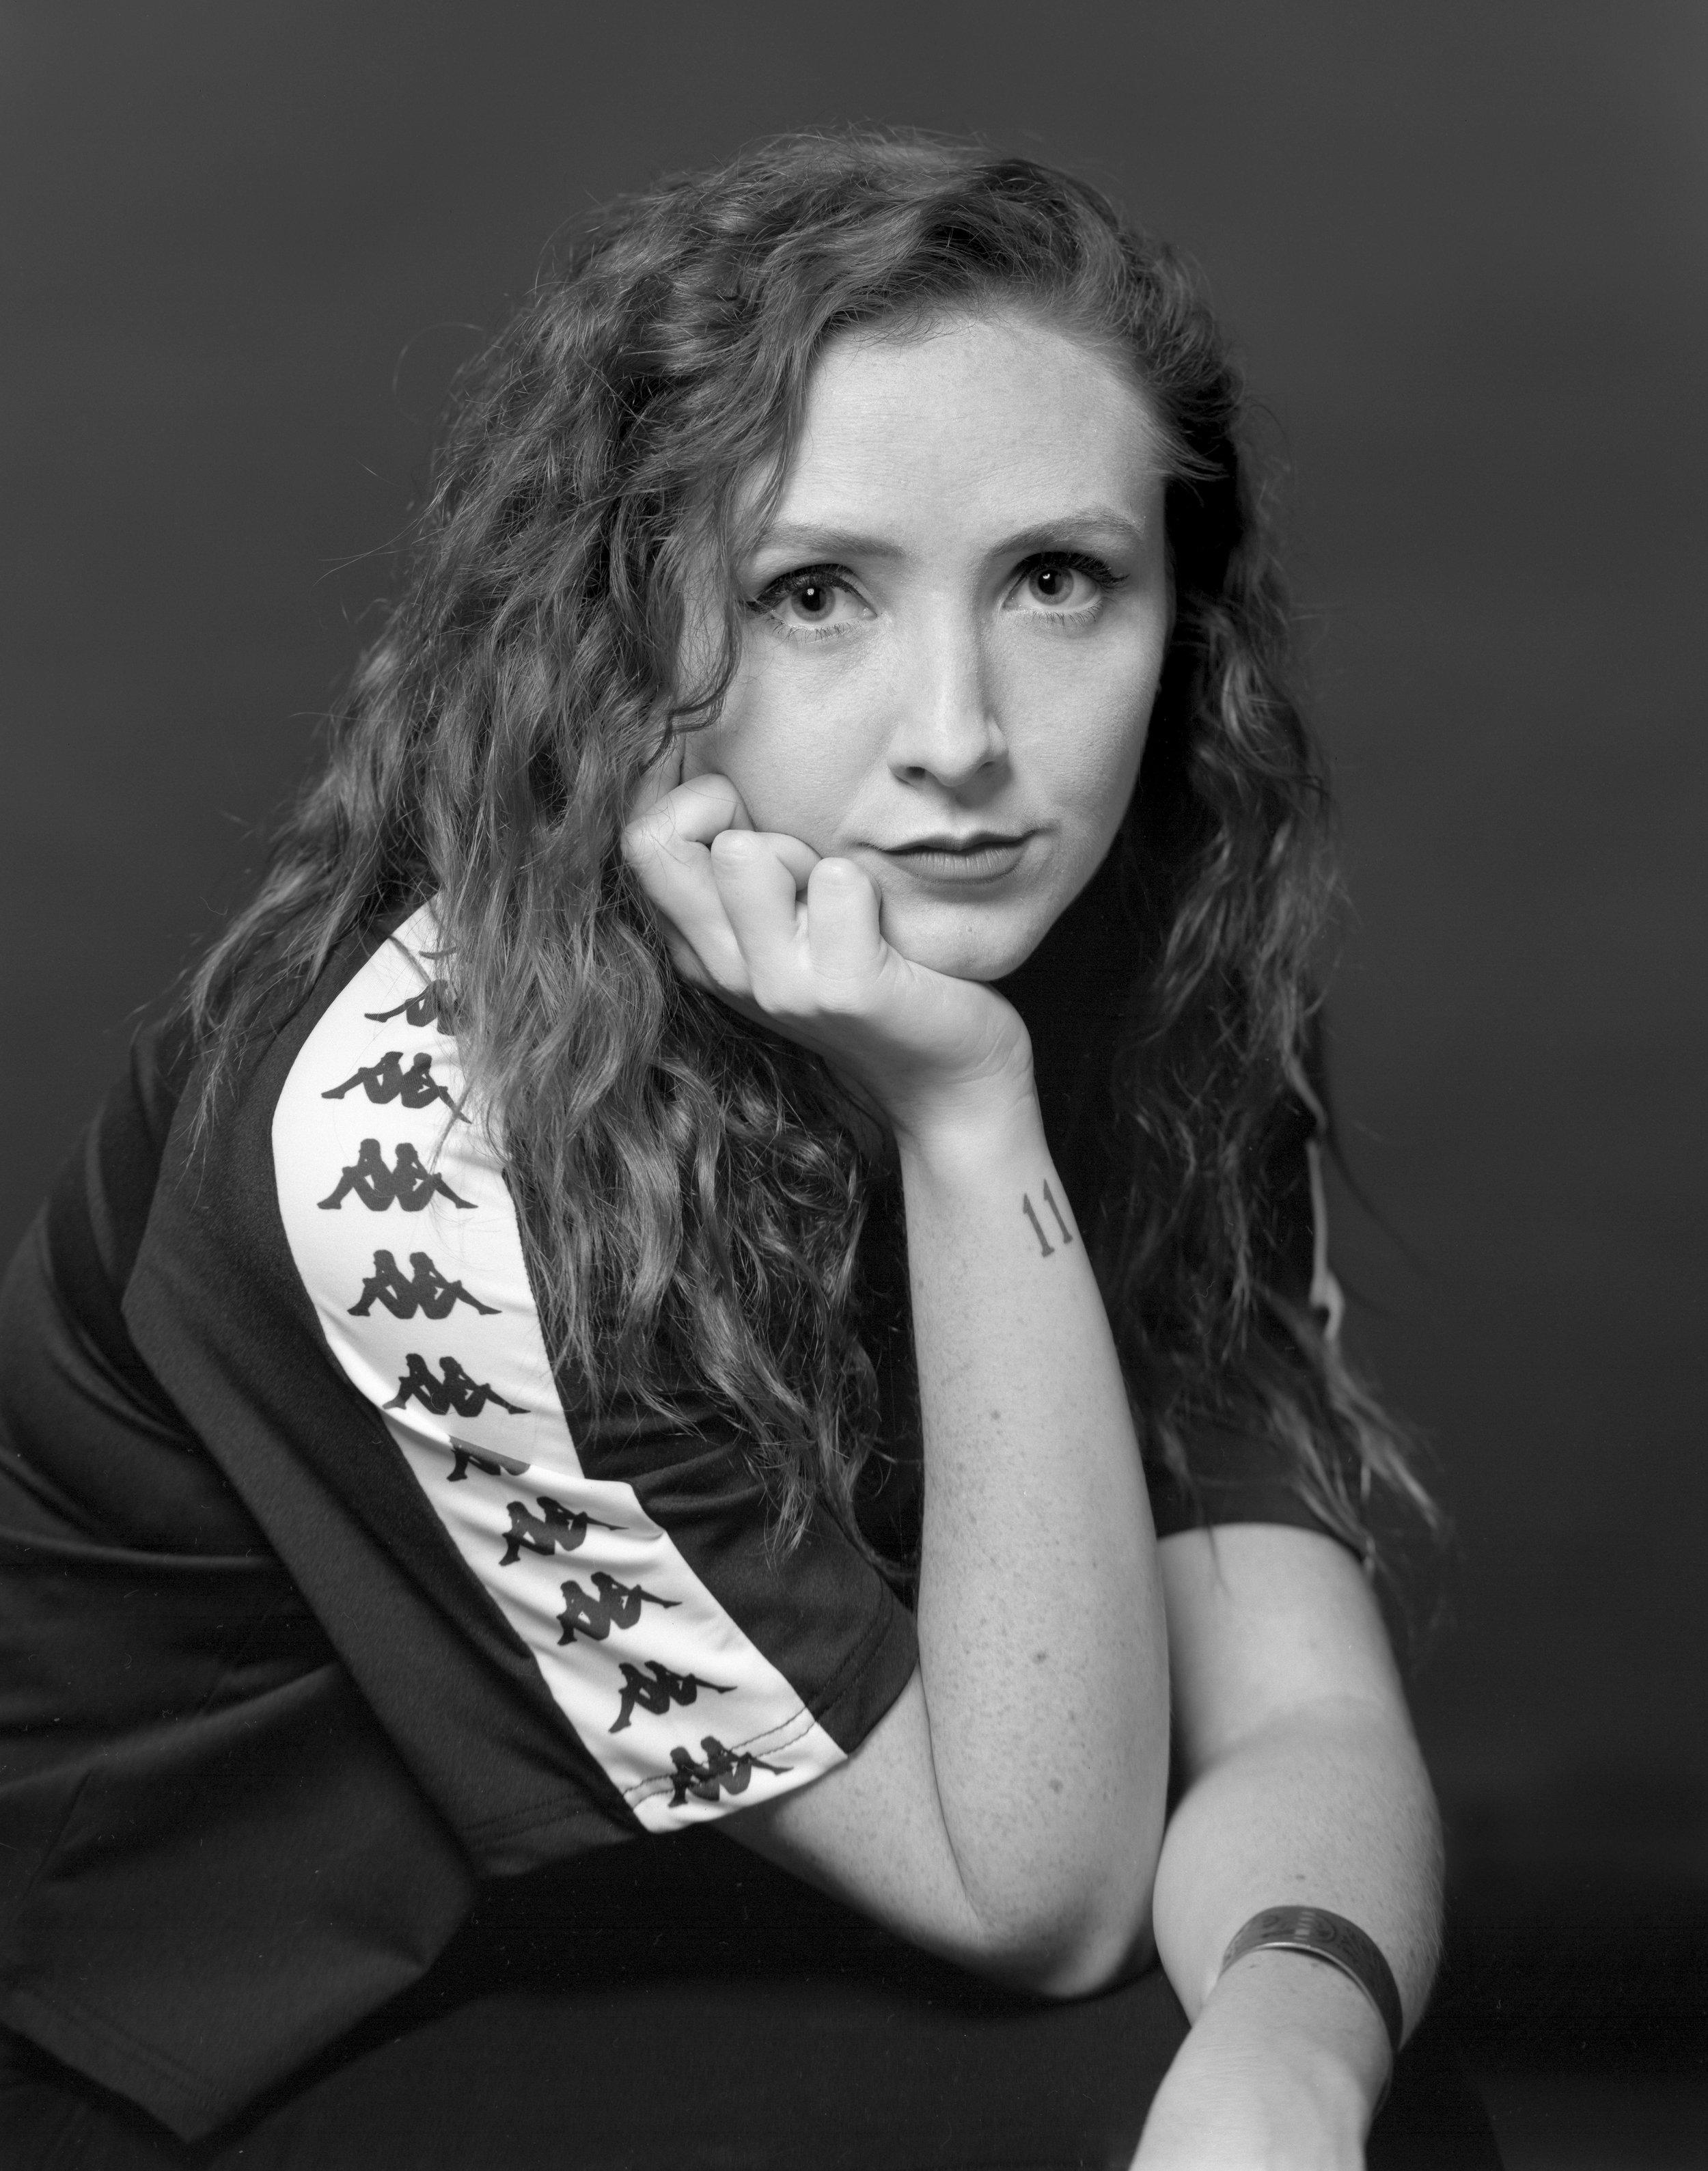 Portrait by Harrison Glazier, styled by DEVMO